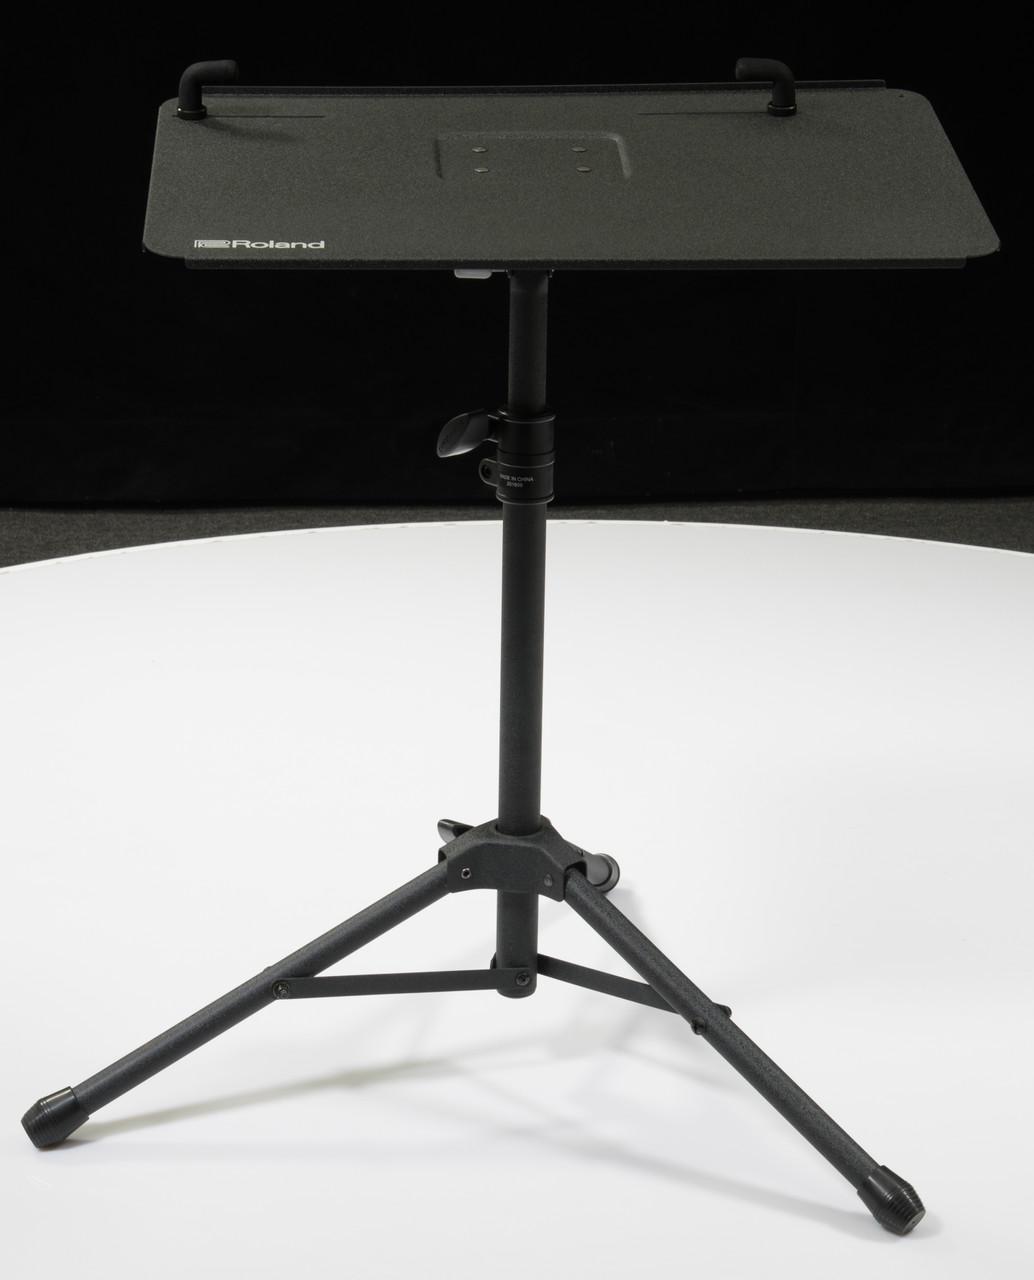 roland ss pc1 adjustable stand for laptop computer. Black Bedroom Furniture Sets. Home Design Ideas